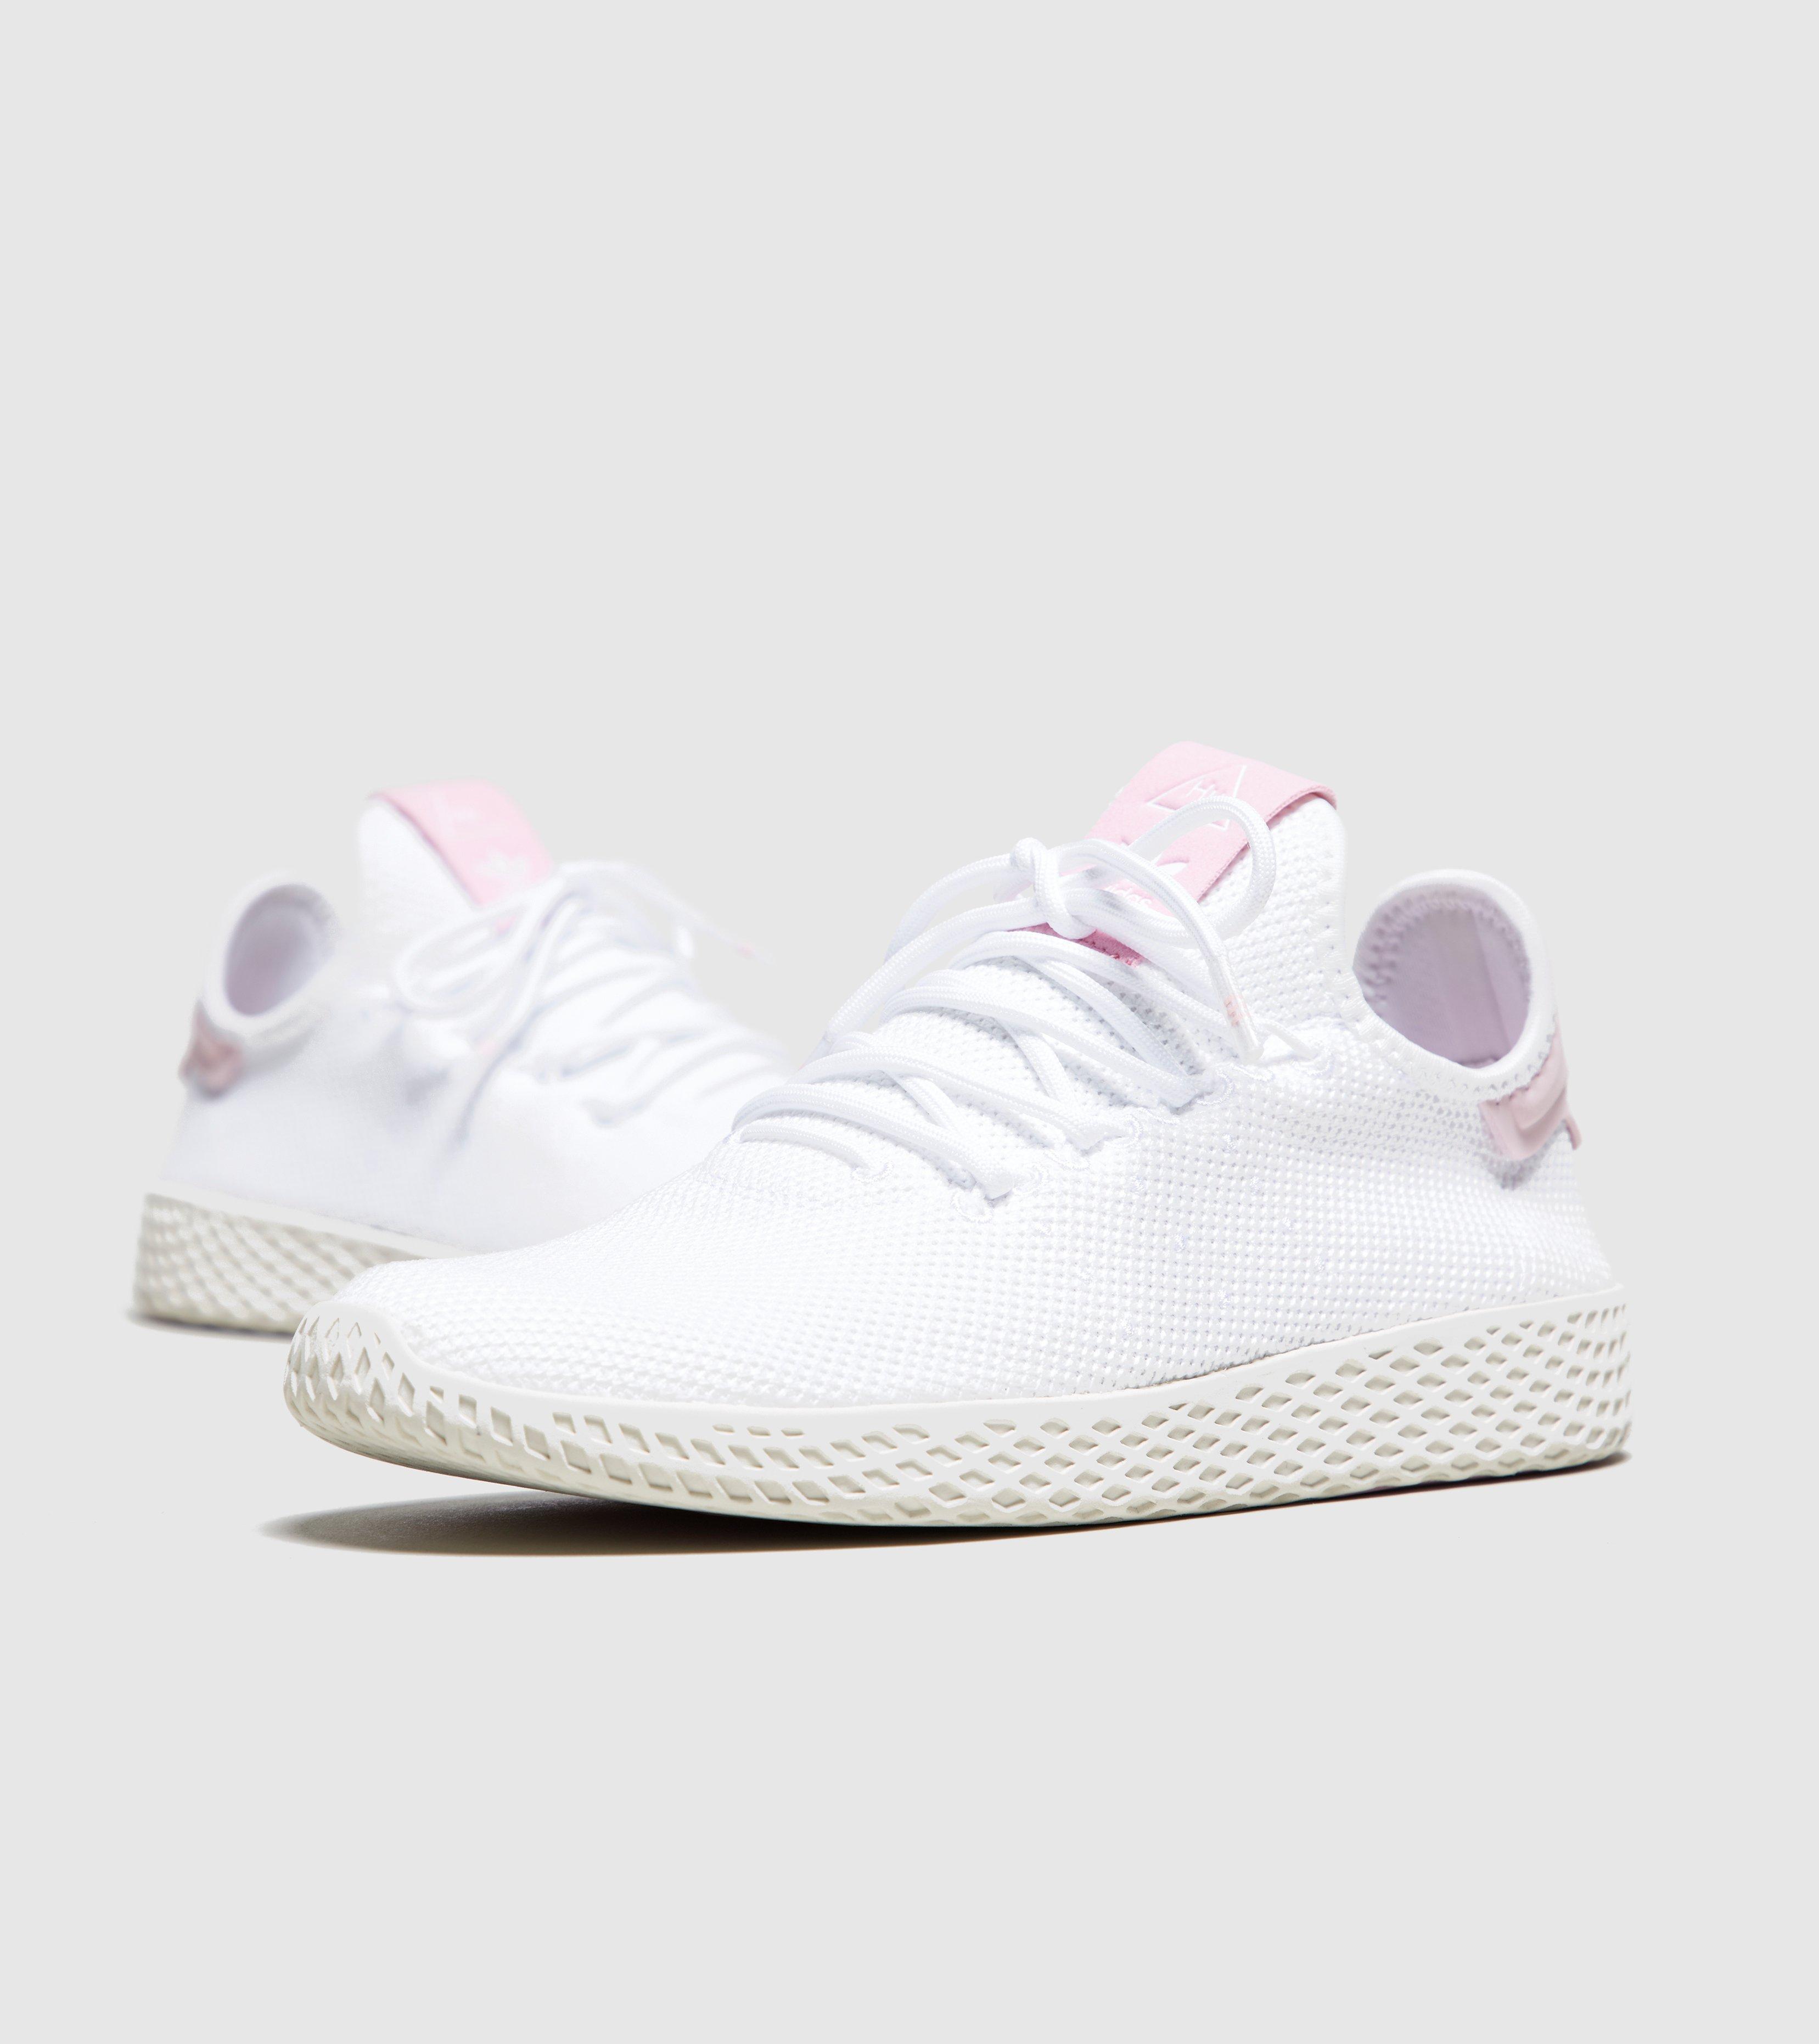 Lyst - adidas Originals X Pharrell Williams Tennis Hu Women s in White 574b9918f4